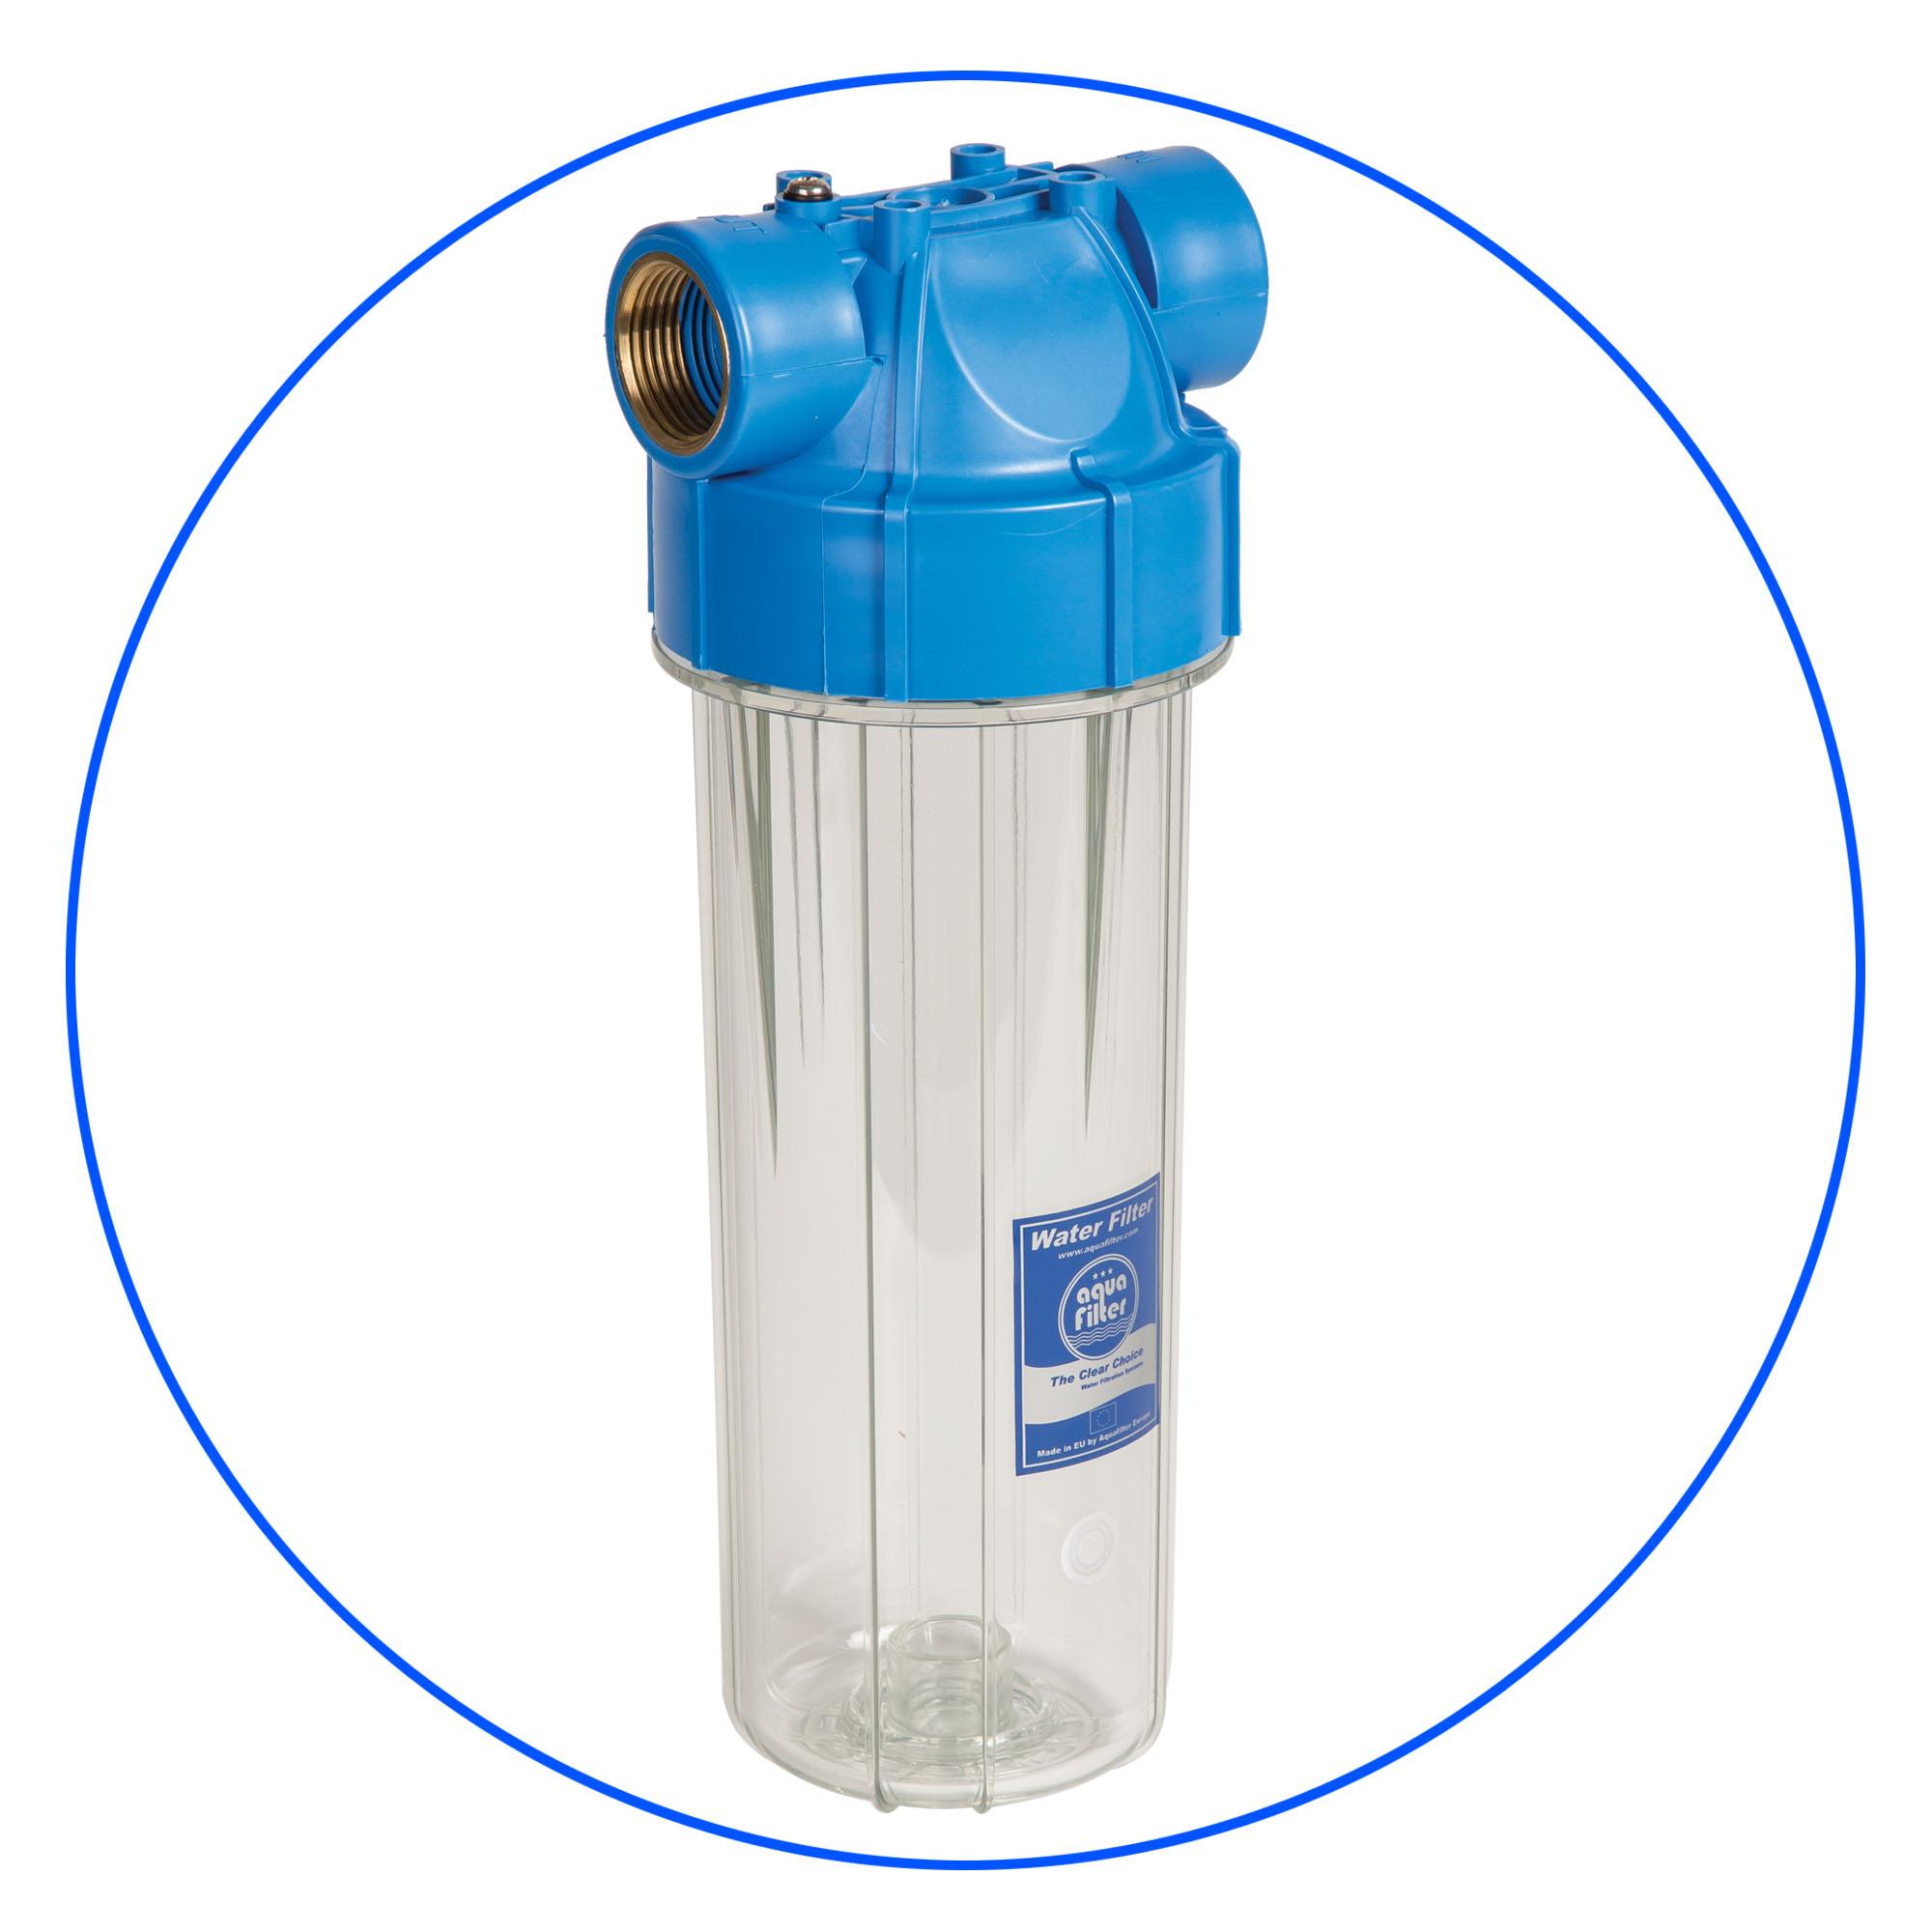 10 Quot Inch Water Filter Housing Fhprx B Aq Aquafilter